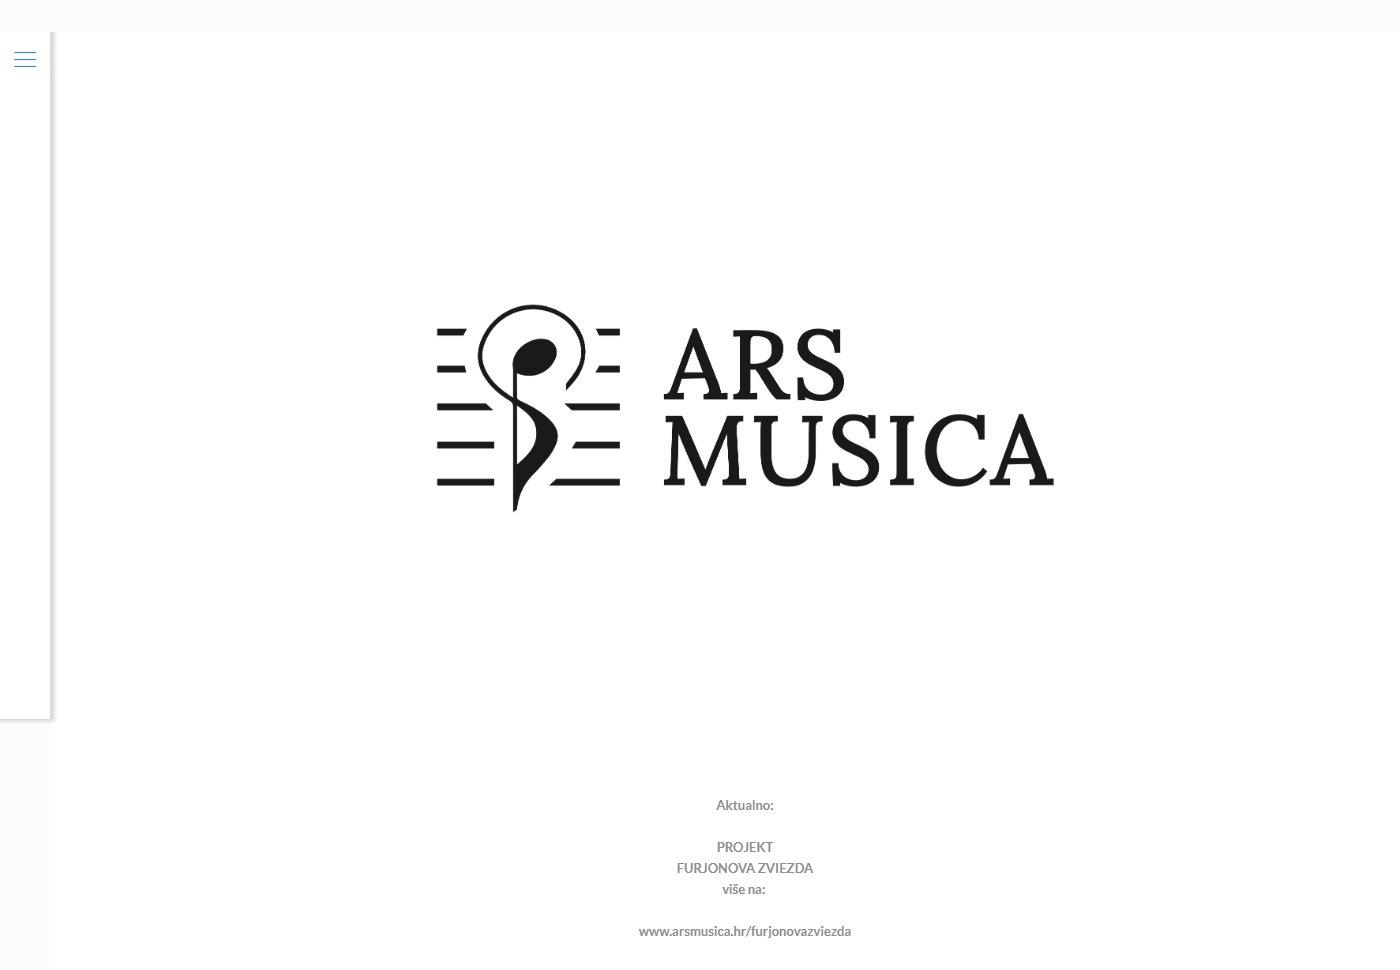 arsmusica-full